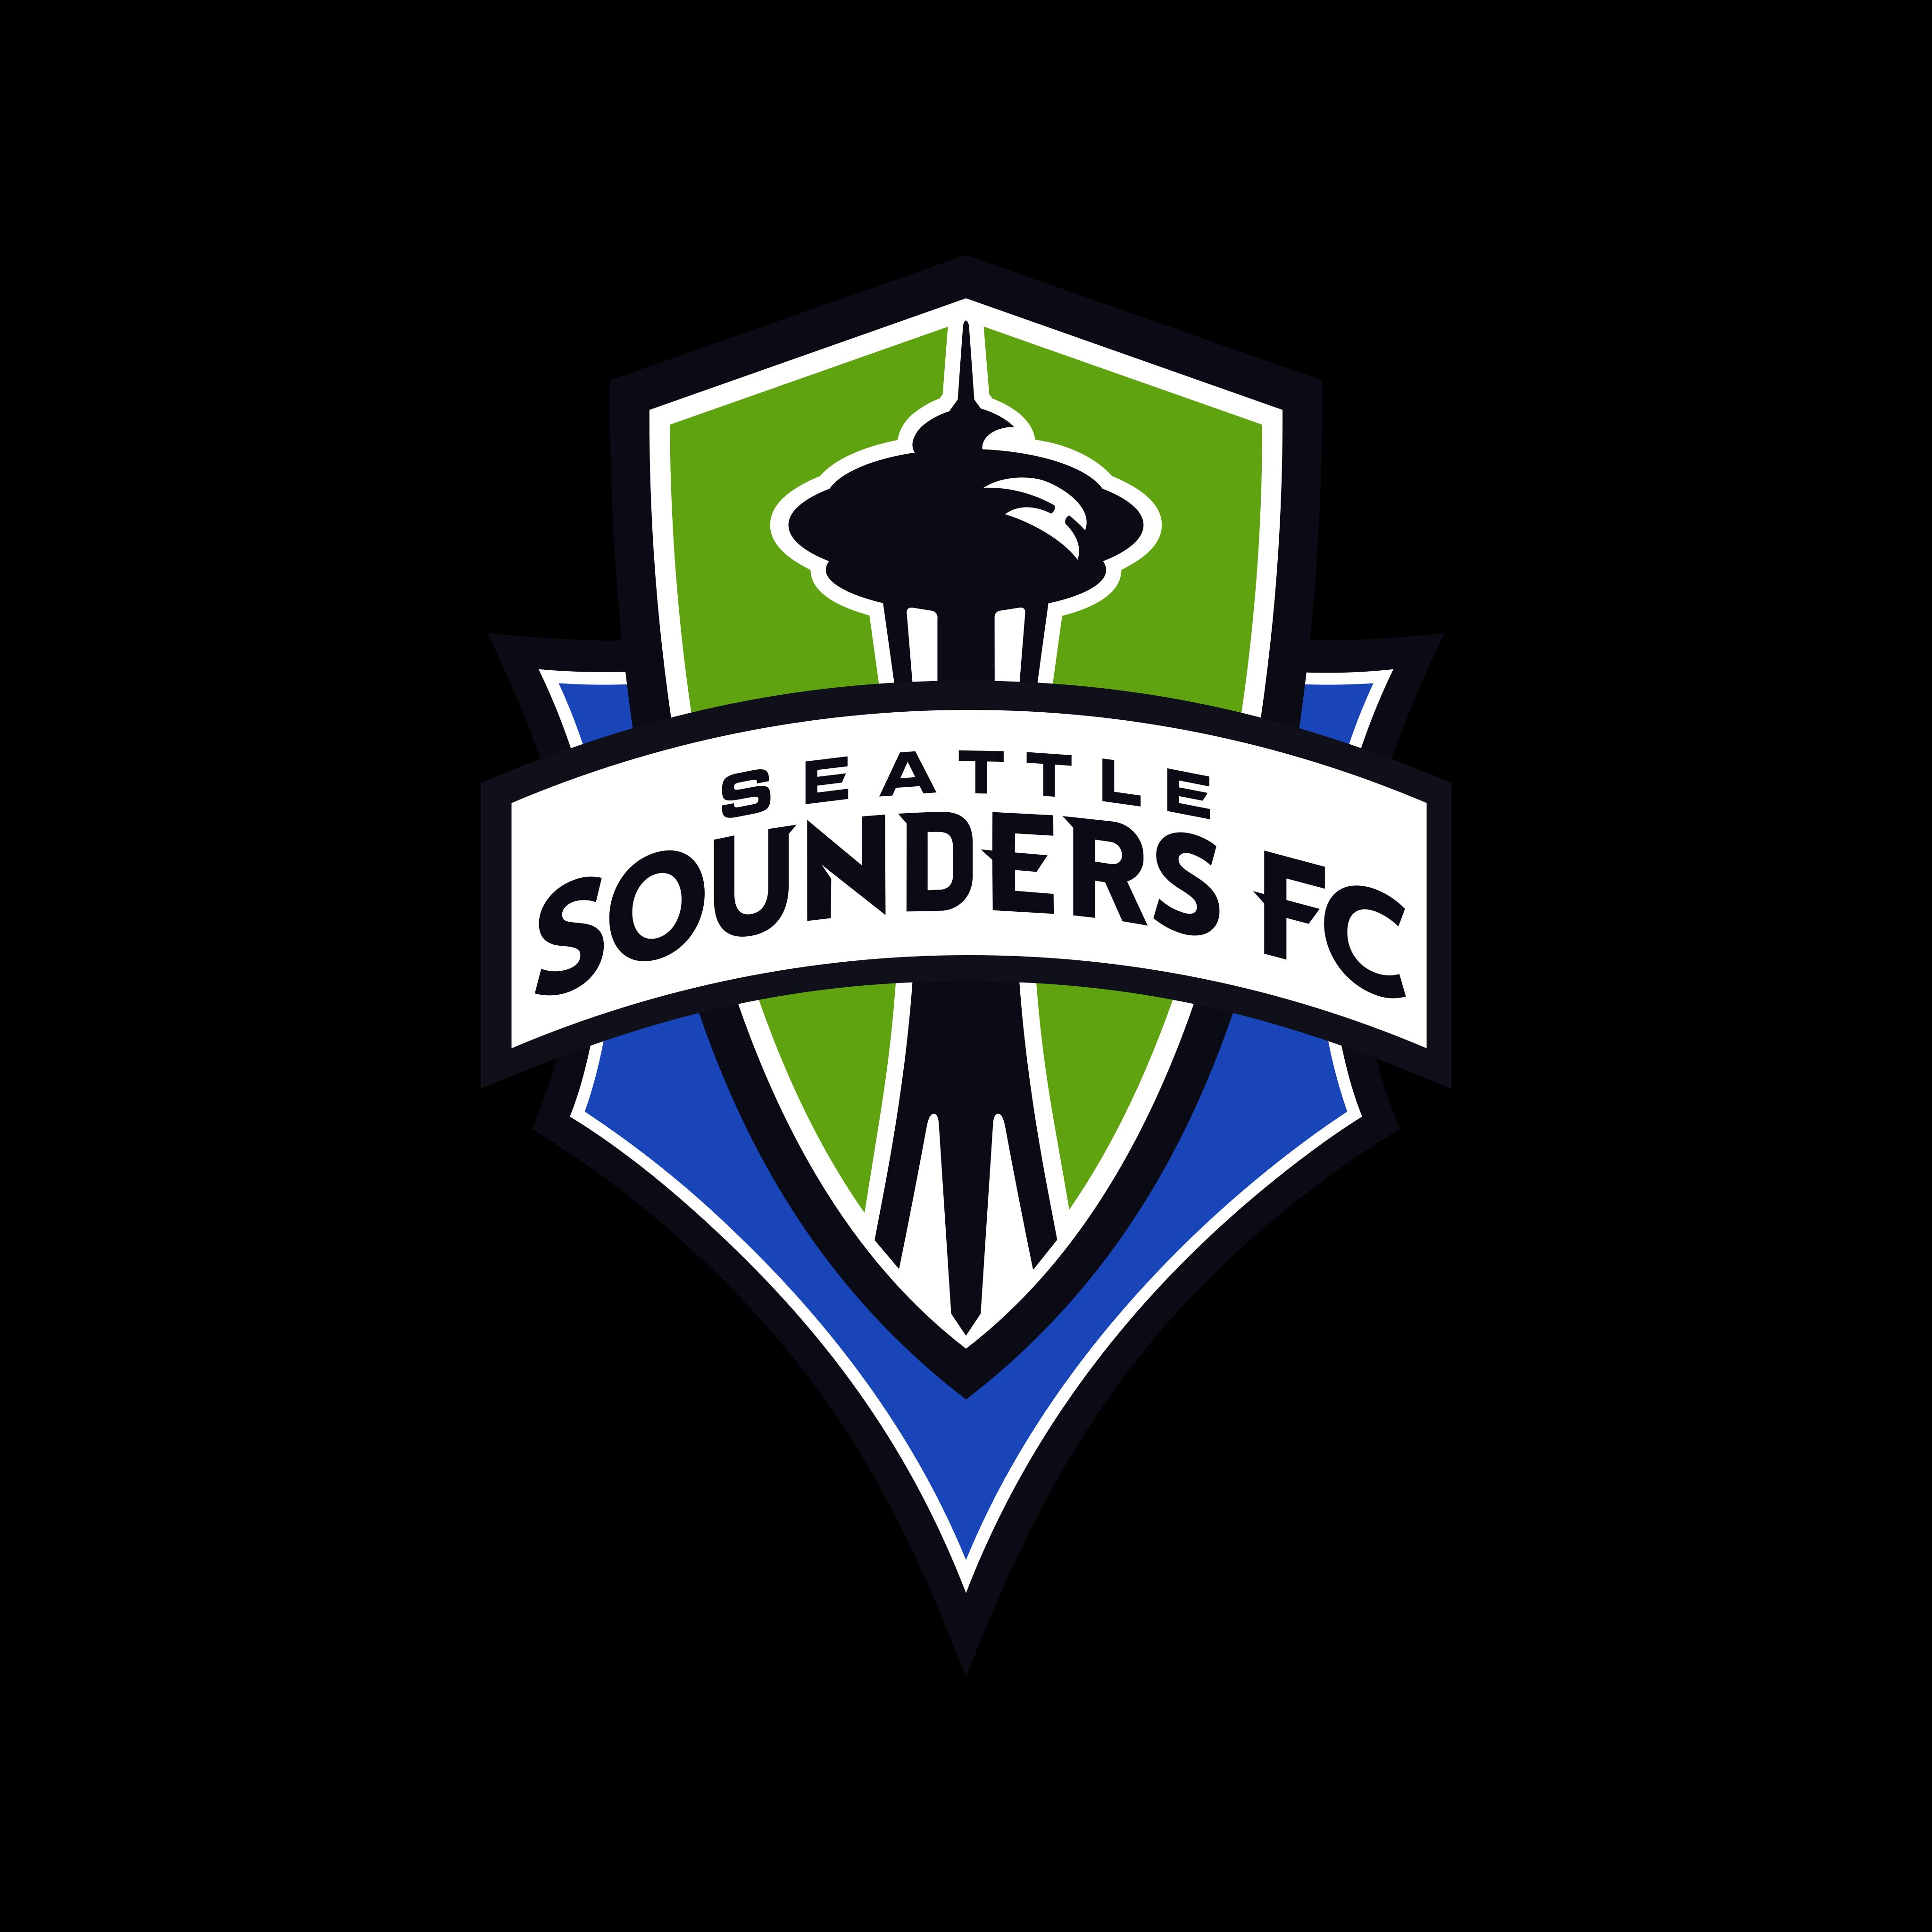 seattle sounders fc logo 0 - Seattle Sounders FC Logo